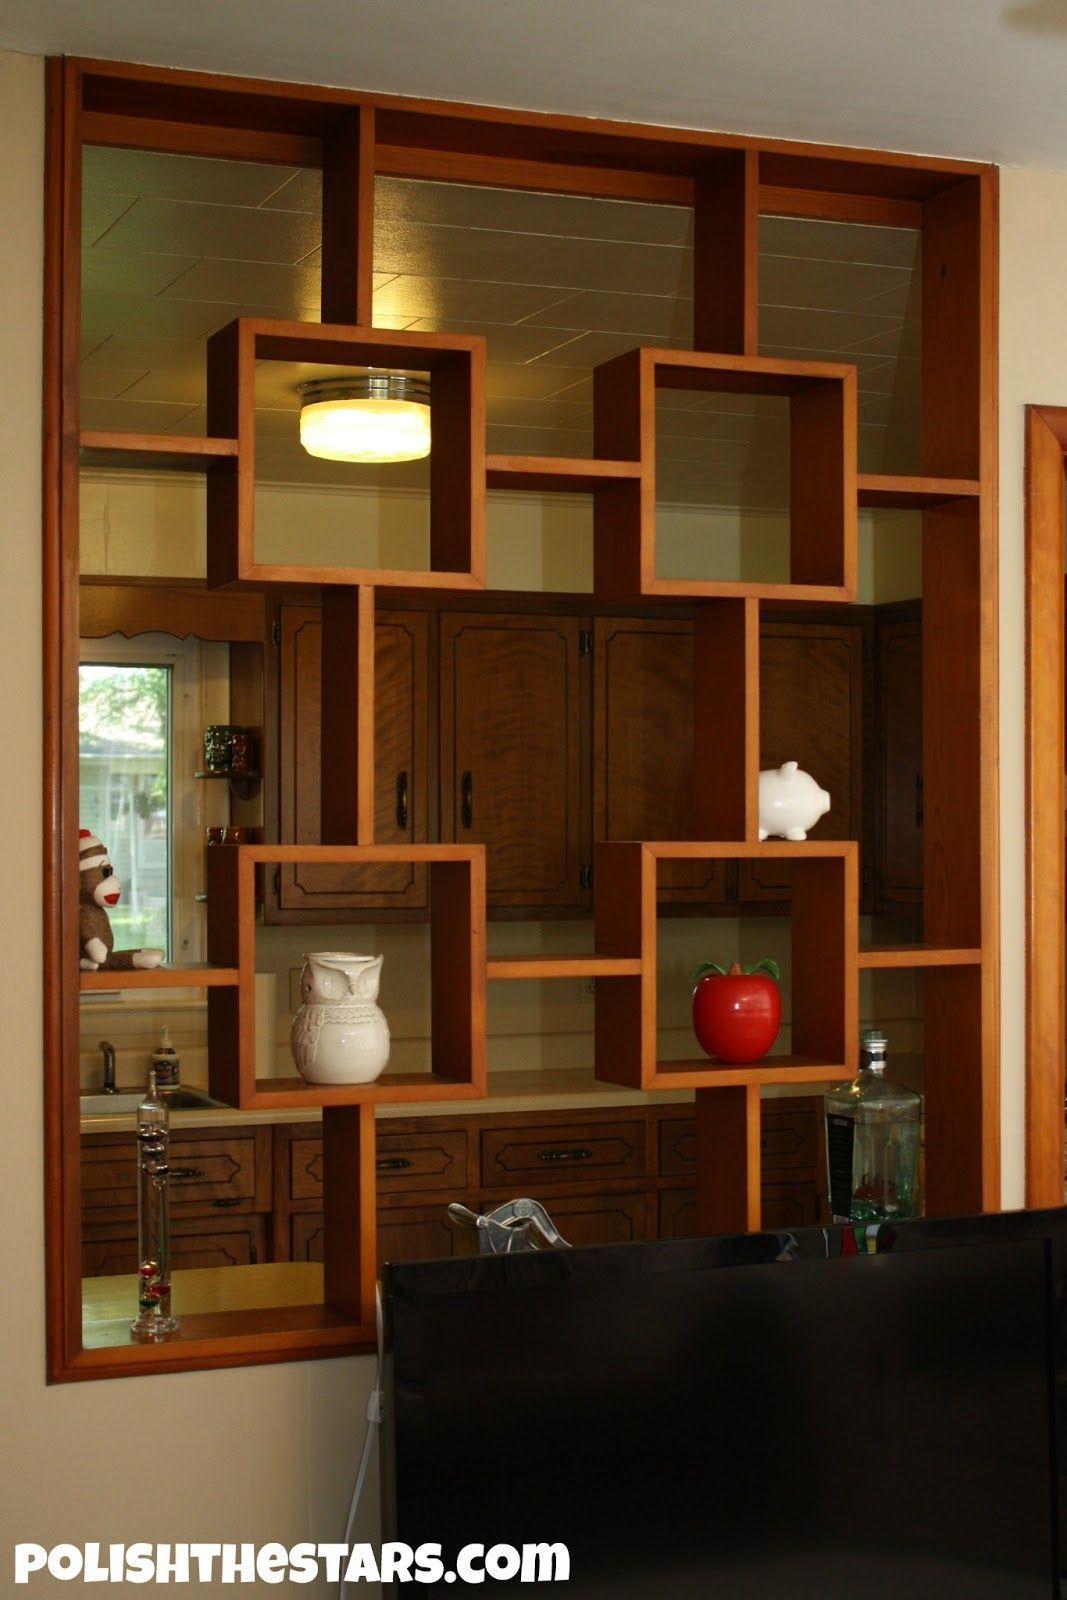 Fascinating half wall room divider for interior design home